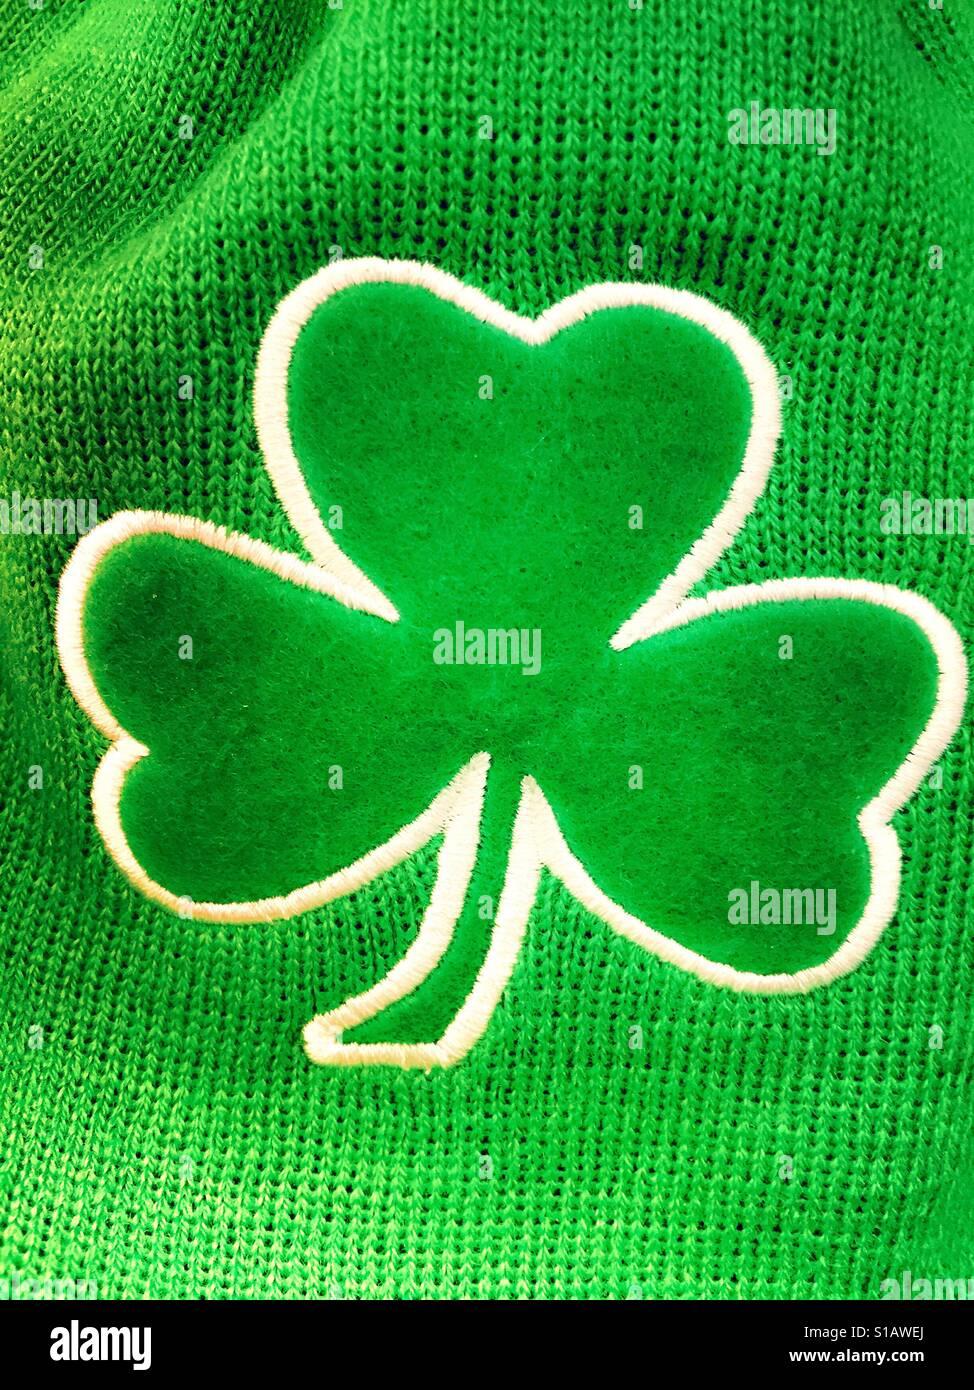 Shamrock sewn onto green St. Patrick's Day merchandise, USA - Stock Image